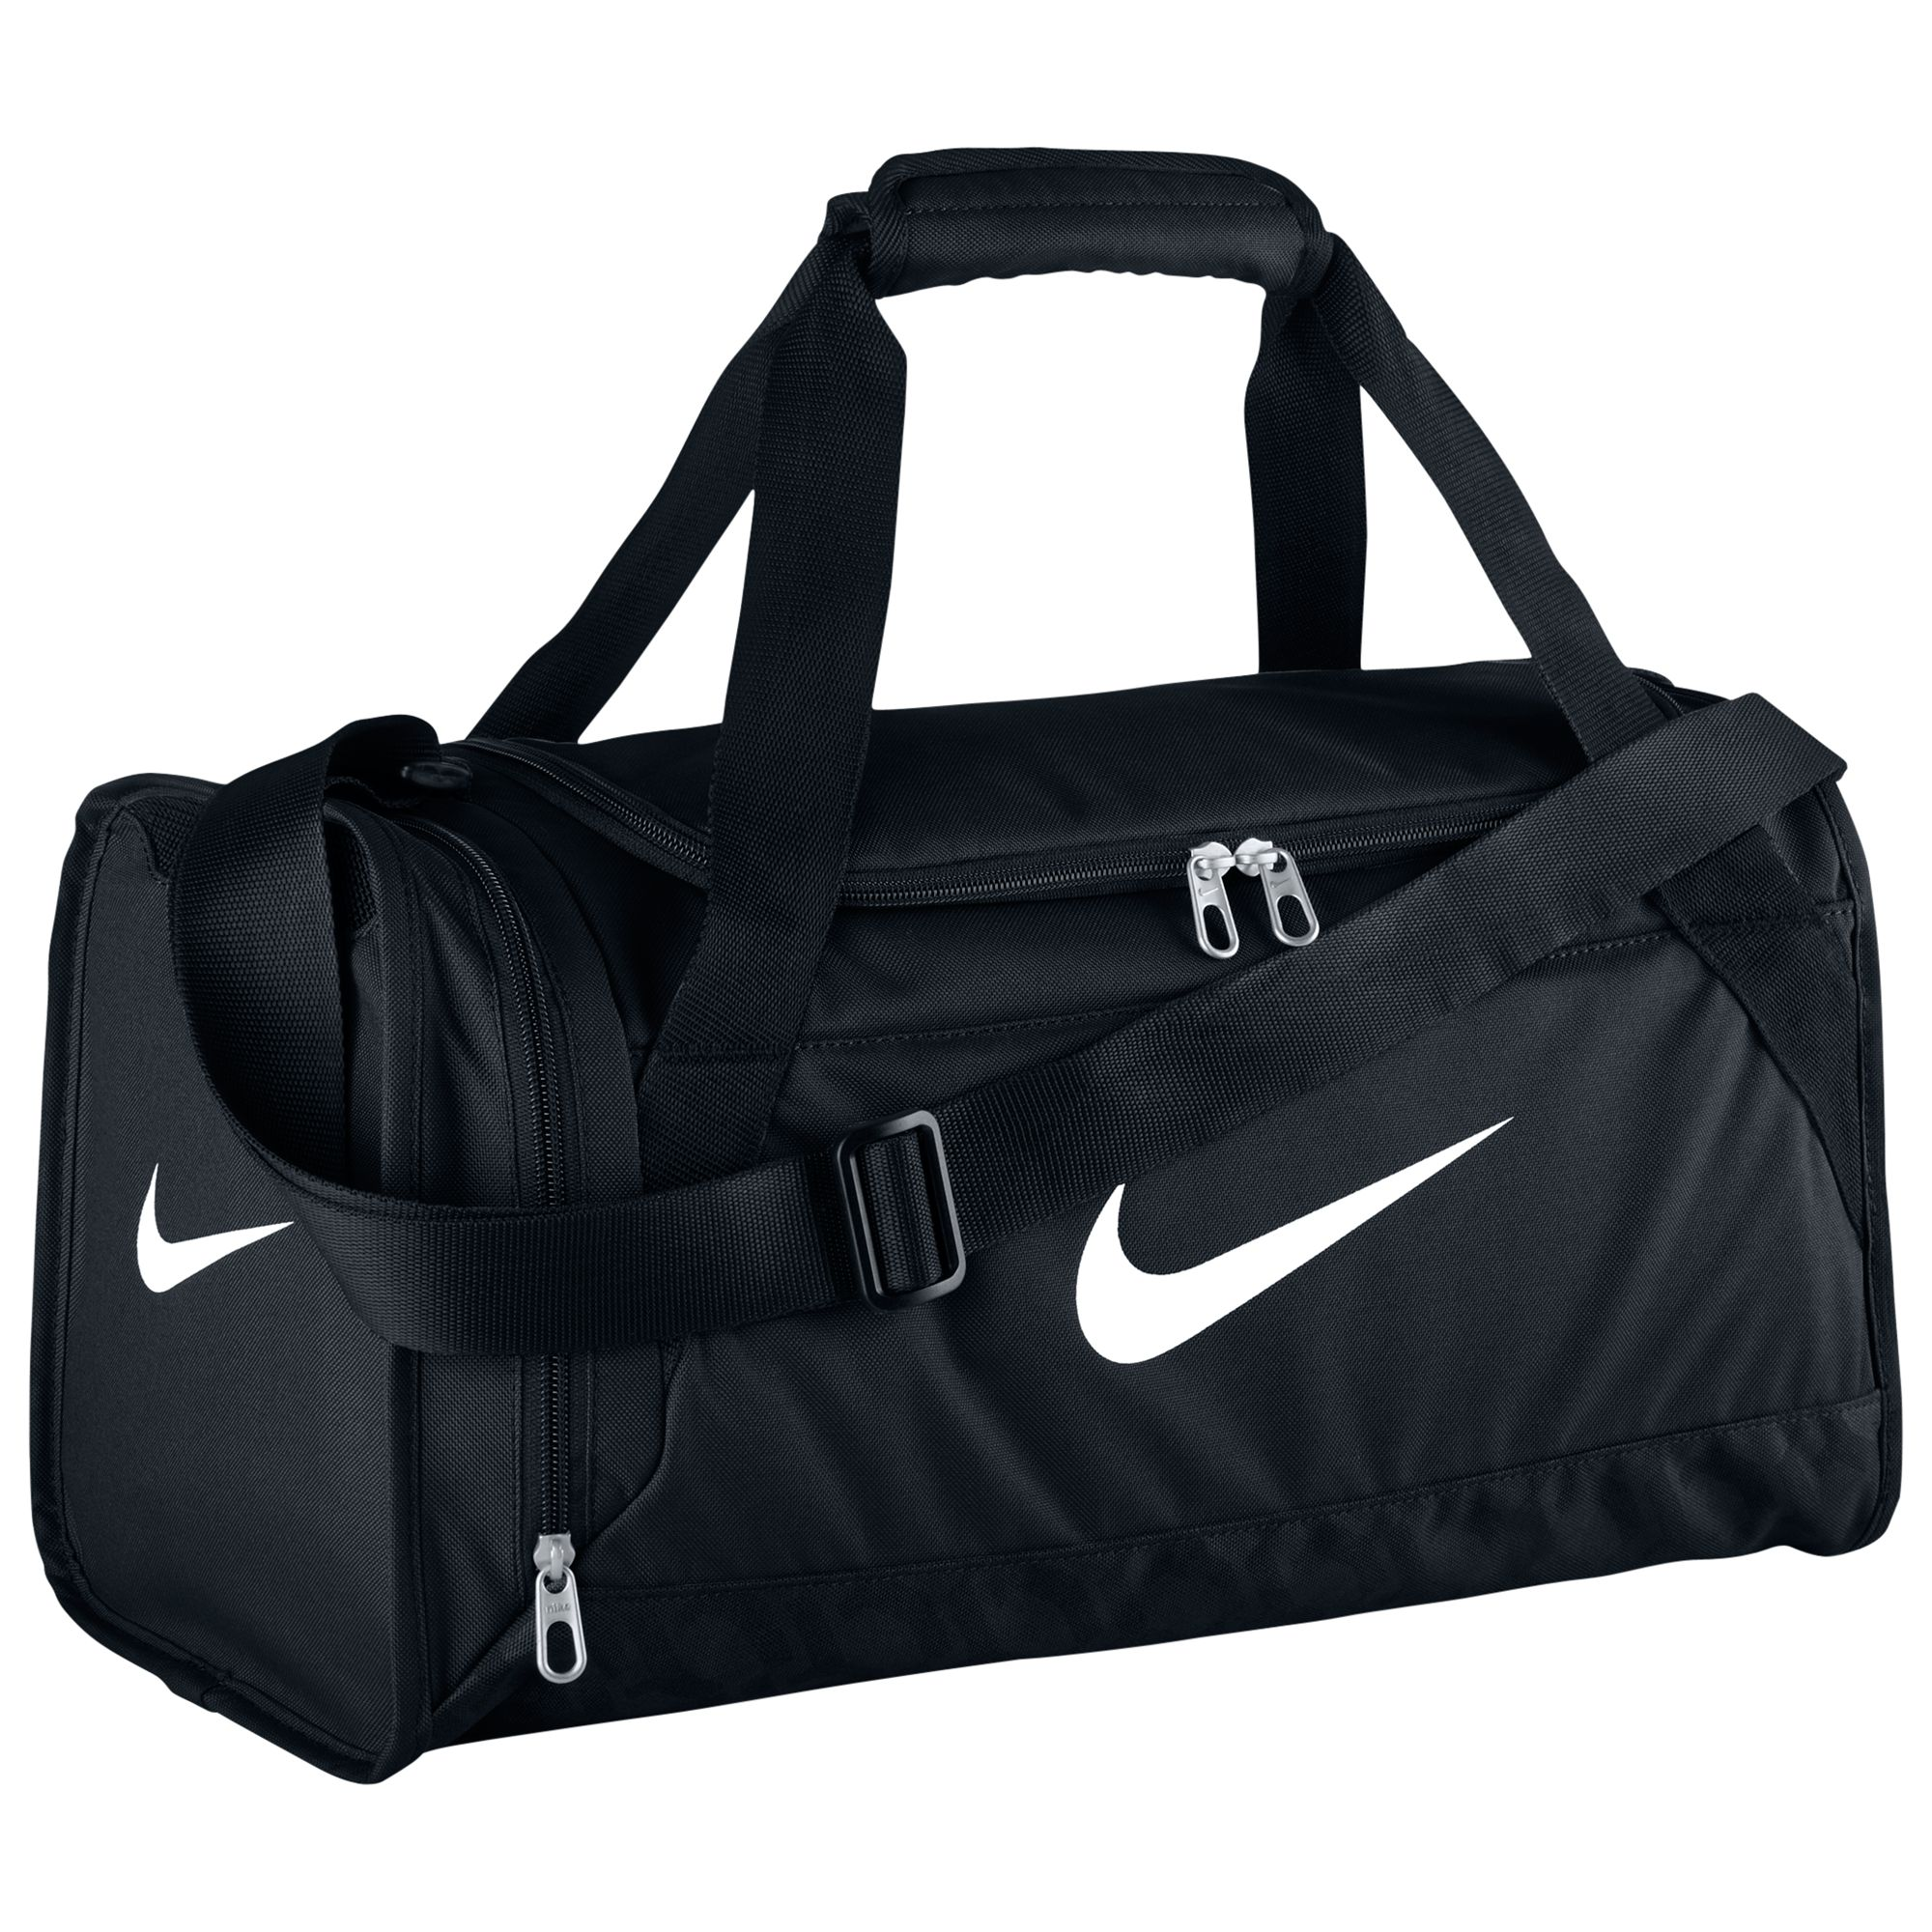 Contabilidad Turista Gruñido  Nike Brasilia 6 Duffel Bag, Extra Small at John Lewis & Partners